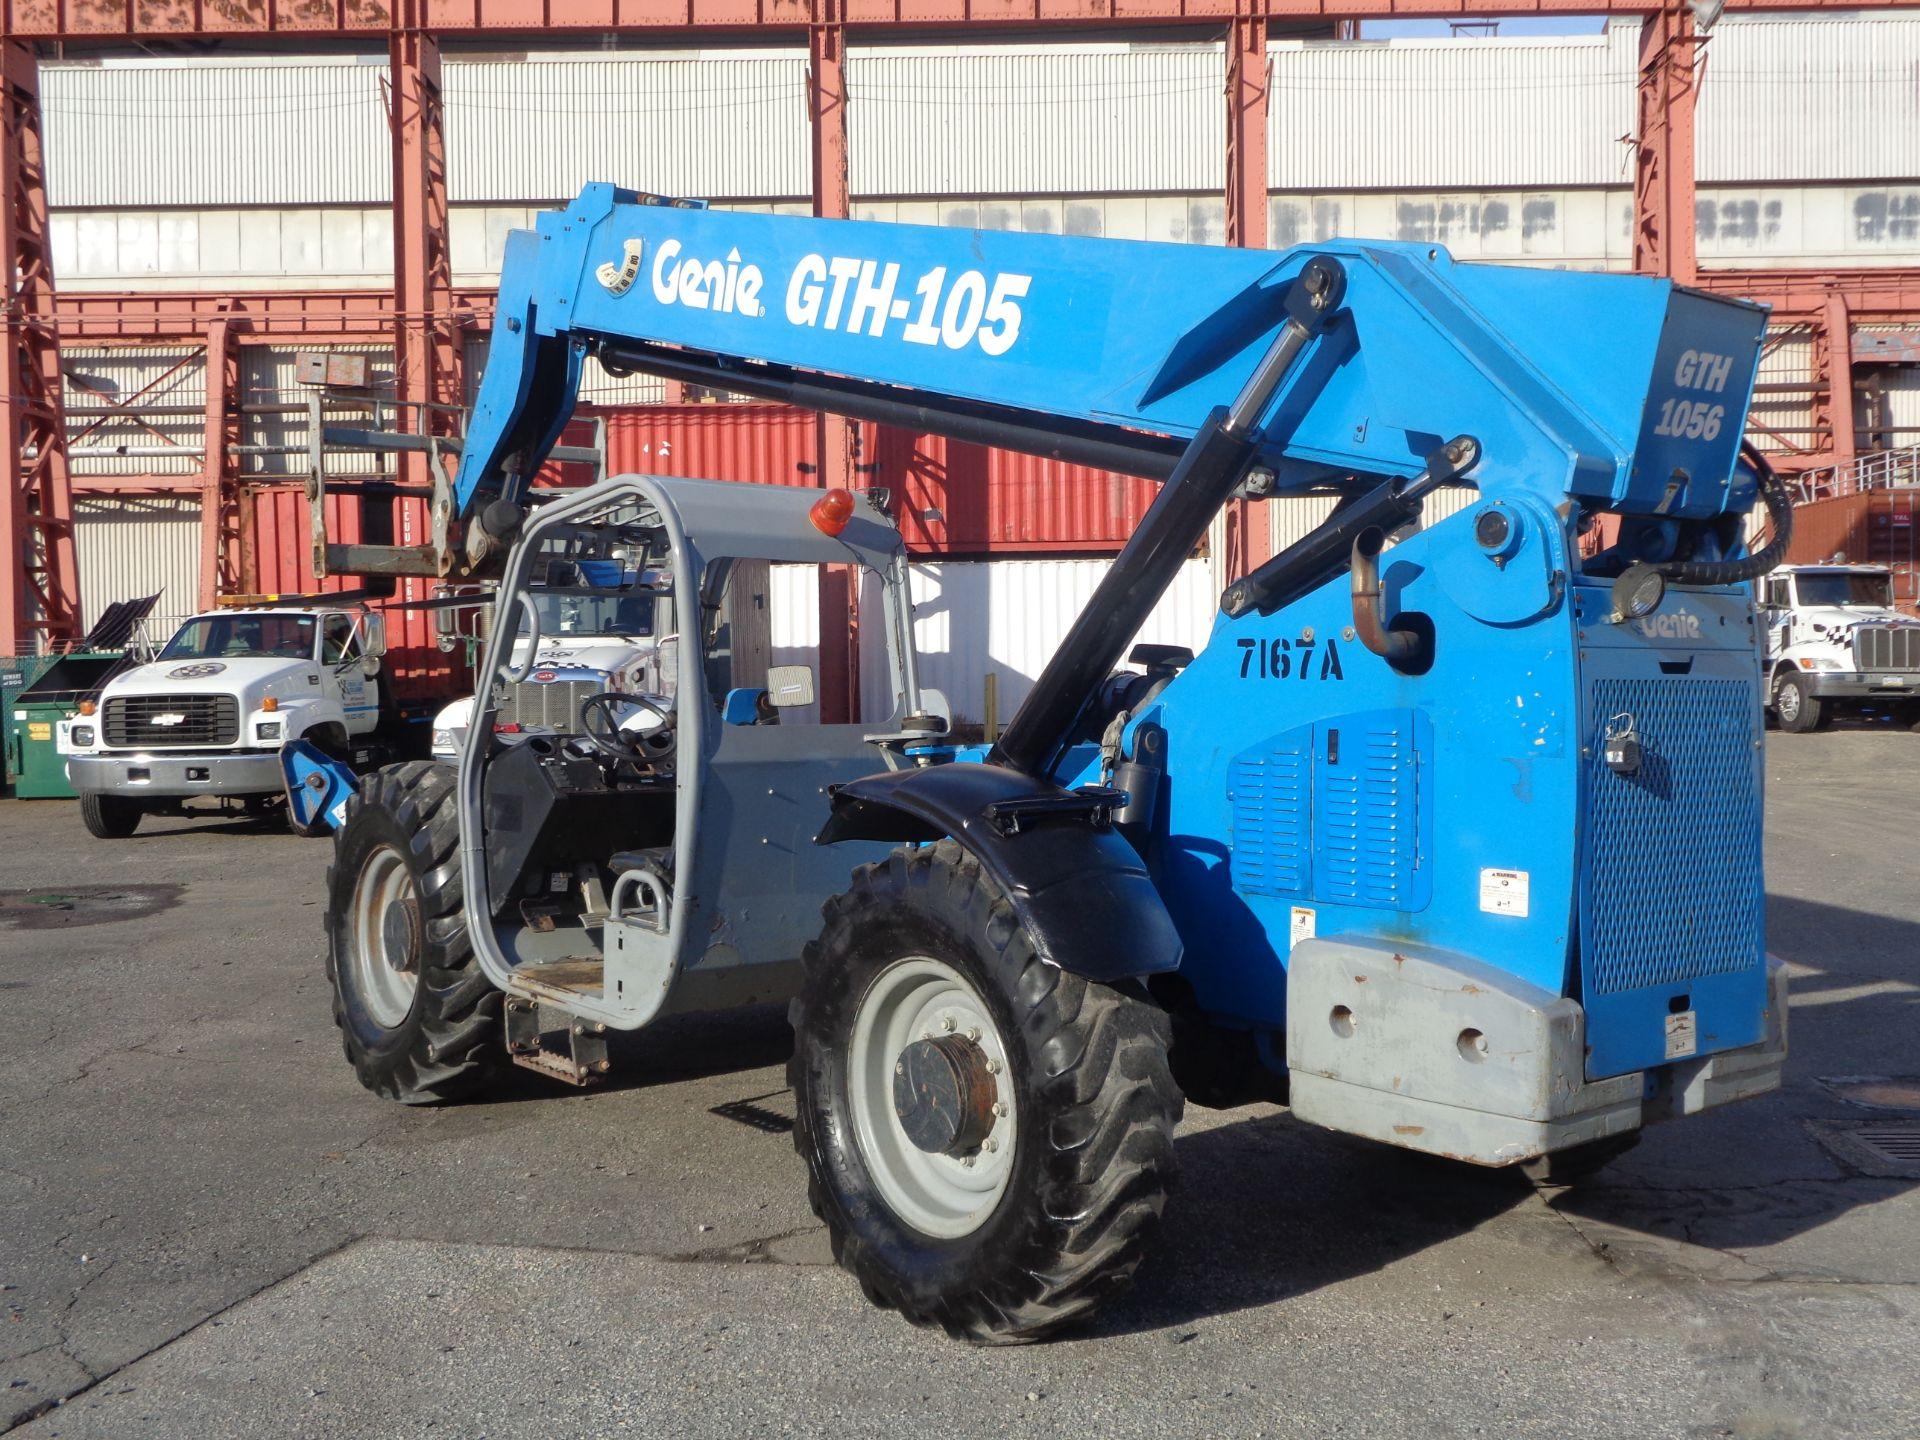 Lot 45a - 2013 Genie GTH1056 10,000 lb Telescopic Forklift